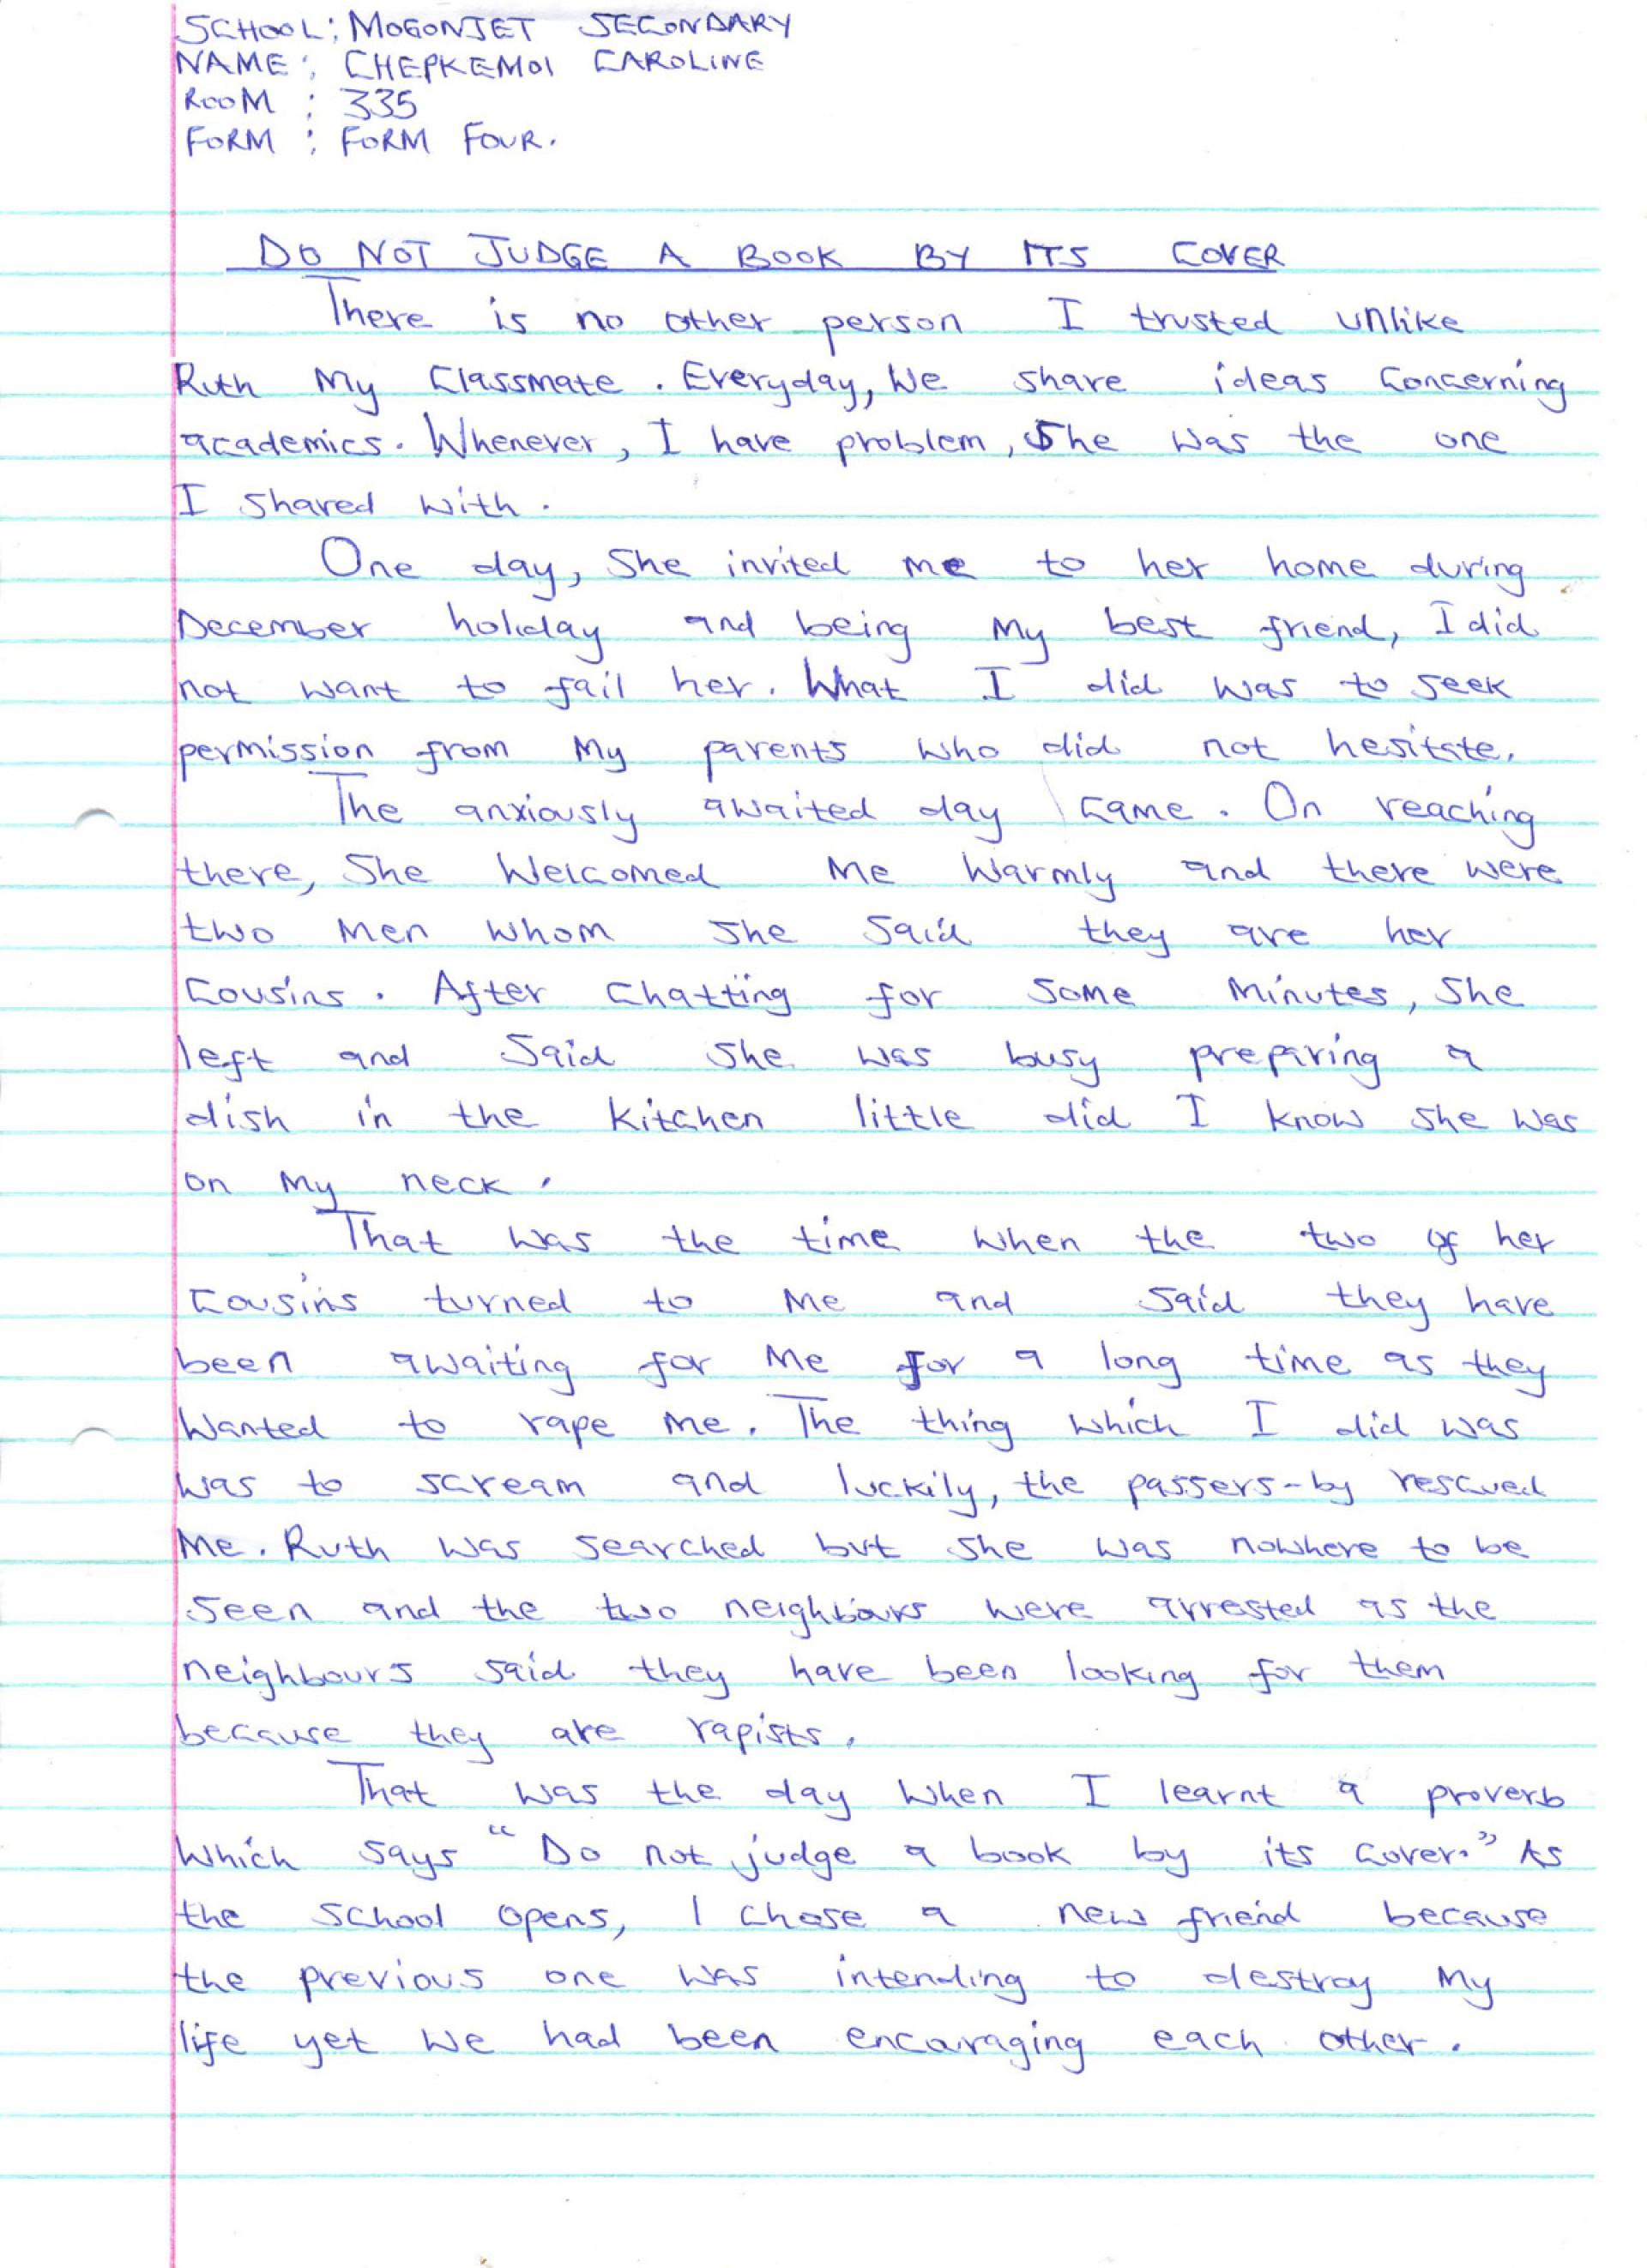 001 Do Aliens Exist Persuasive Essay Book Of Oglasi About Caroline Chepkemoi Not Judge Second Place 4th Comp Masters Mogonjet Beautiful 1920